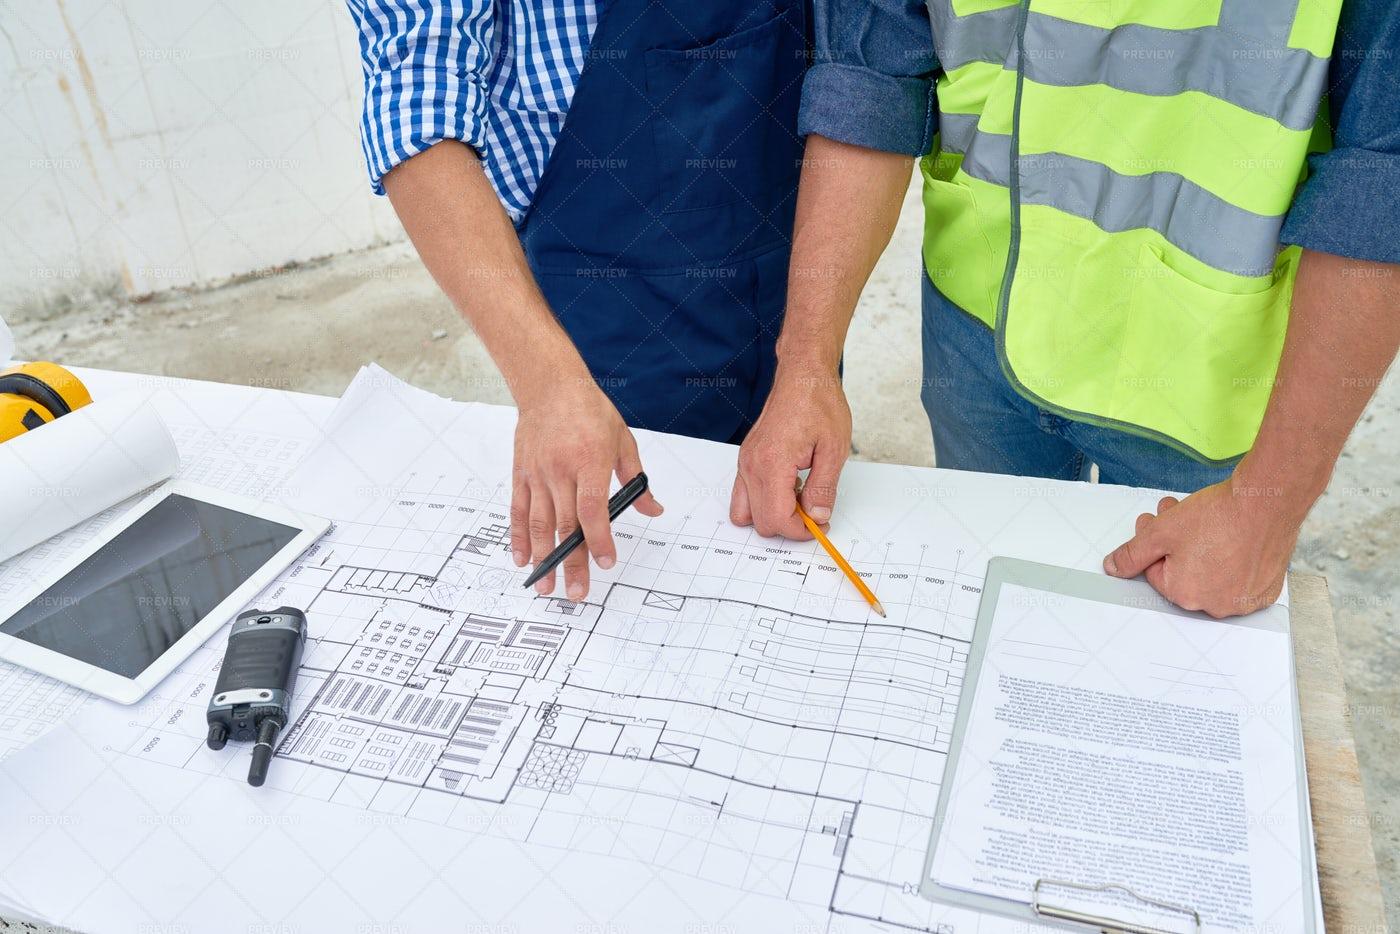 Working Meeting At Construction...: Stock Photos